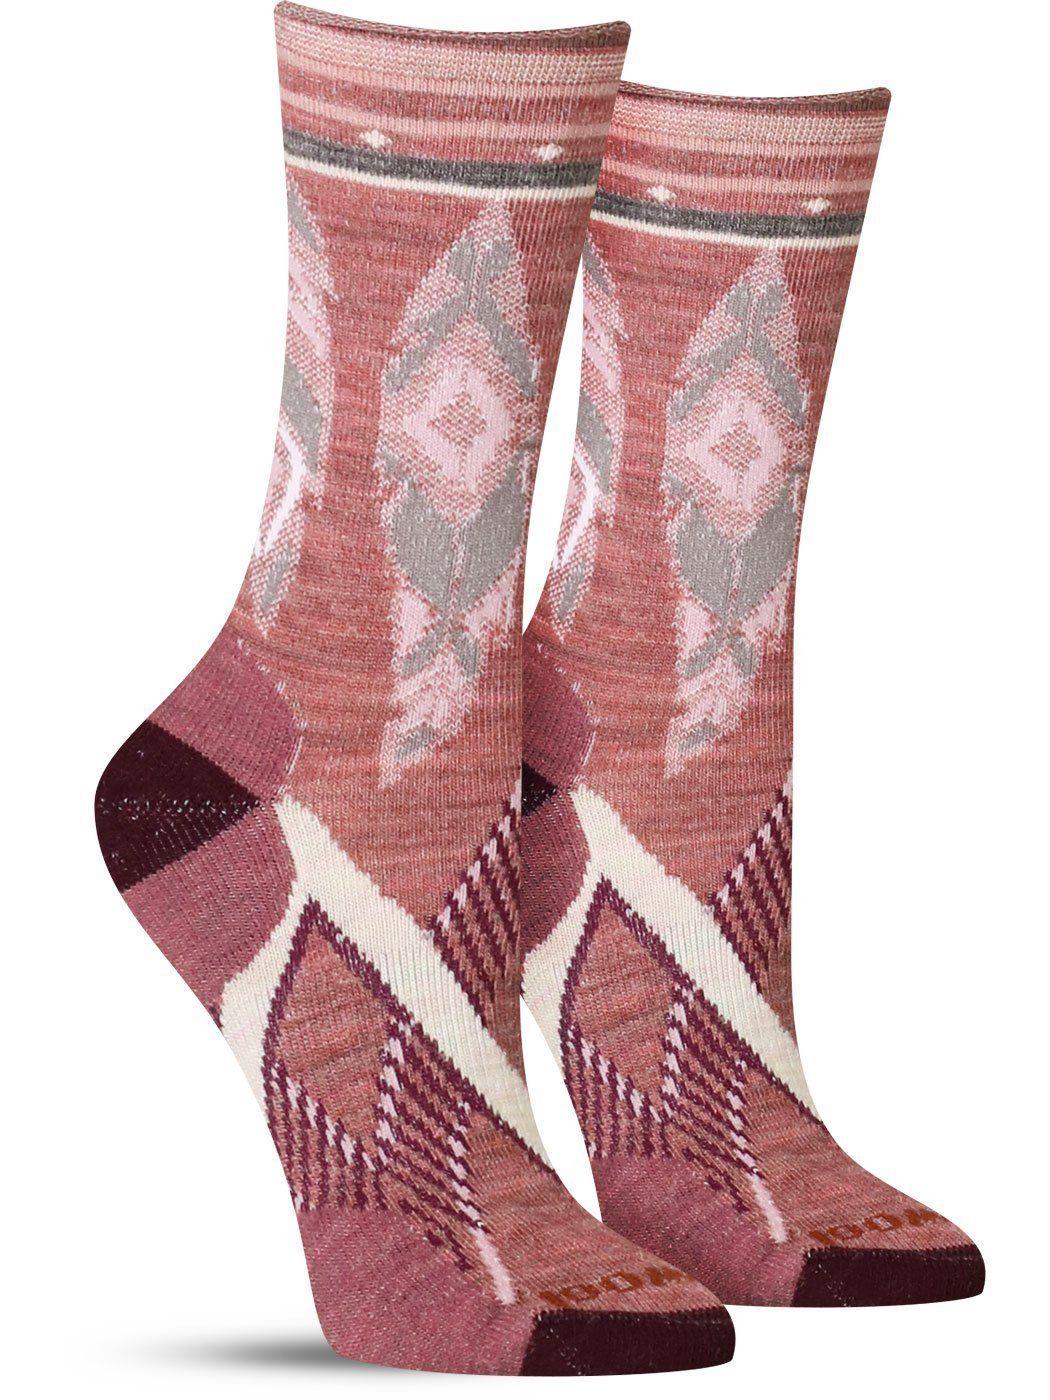 Feather Dream Wool Socks Womens Merino wool socks